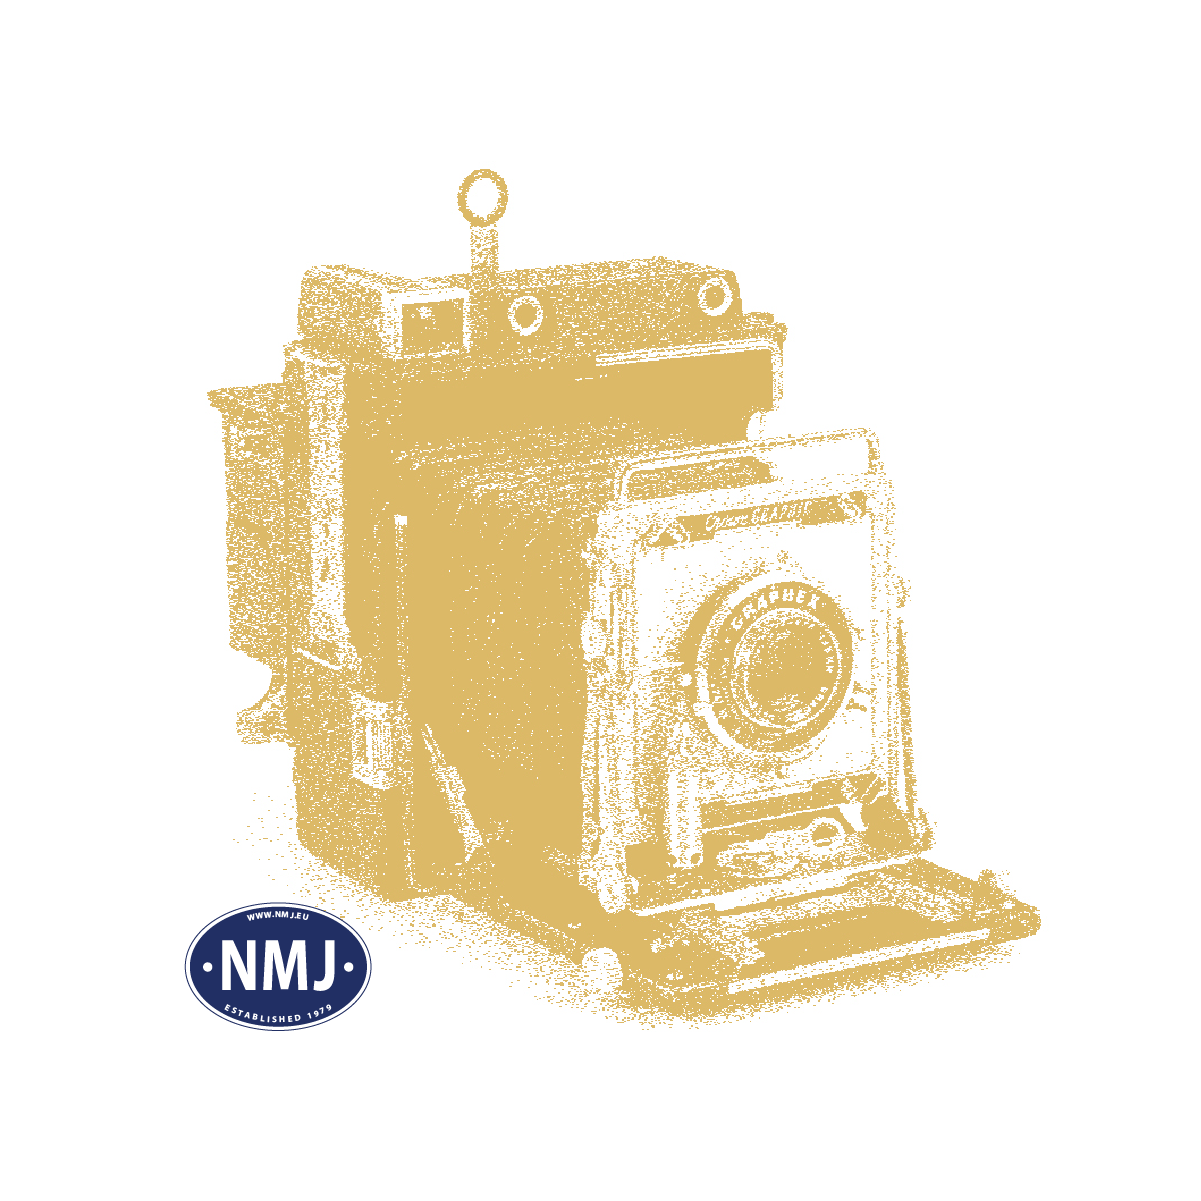 NMJT145004 - NMJ Topline NSB Di3.643, Mellomdesign, DCC m/ Lyd, 0-Skala